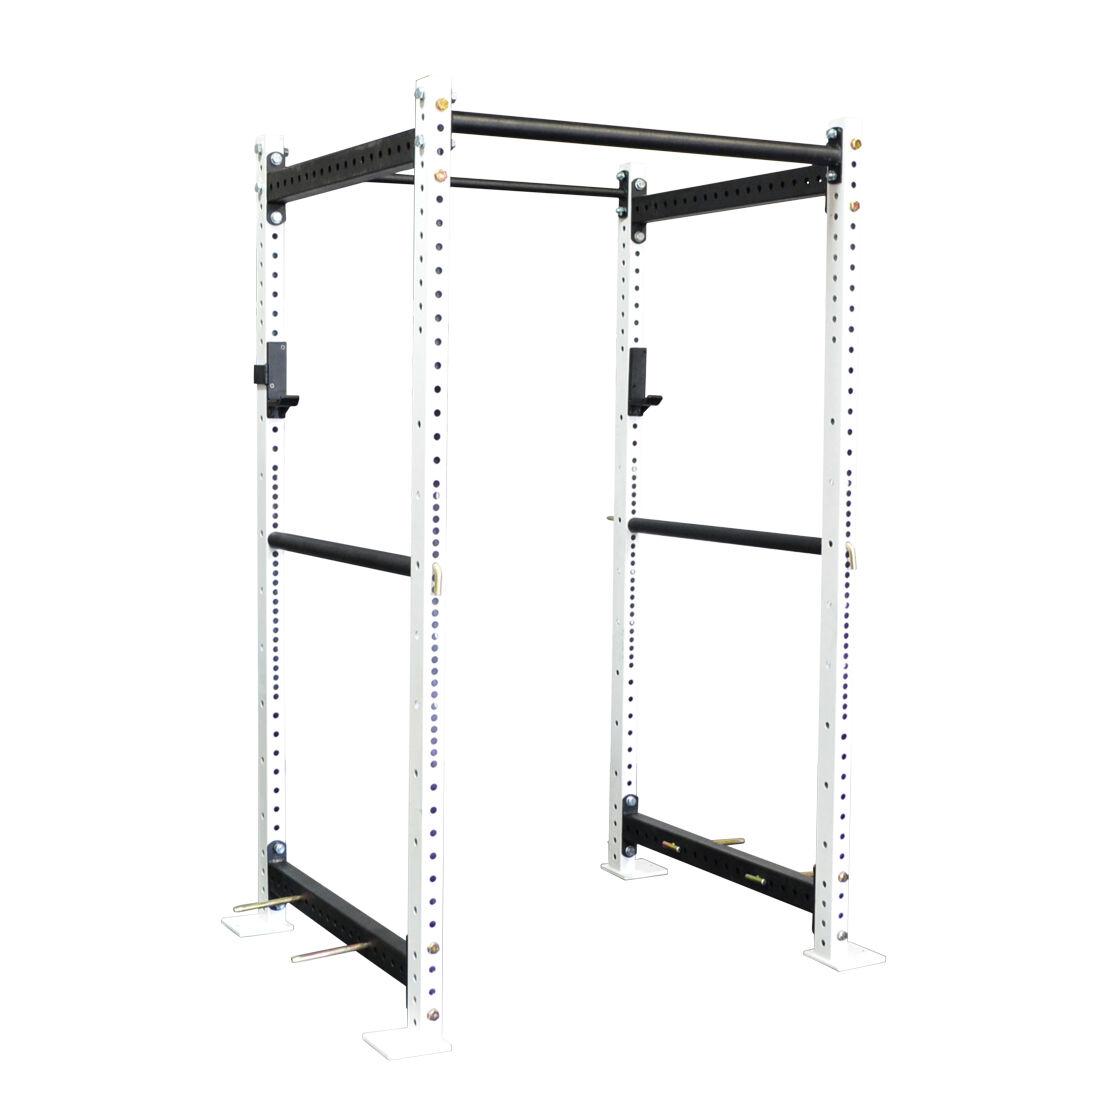 exercise fitness titan fitness t 3 series 82 power rack squat deadlift cage benchpress pull up strength training equipment